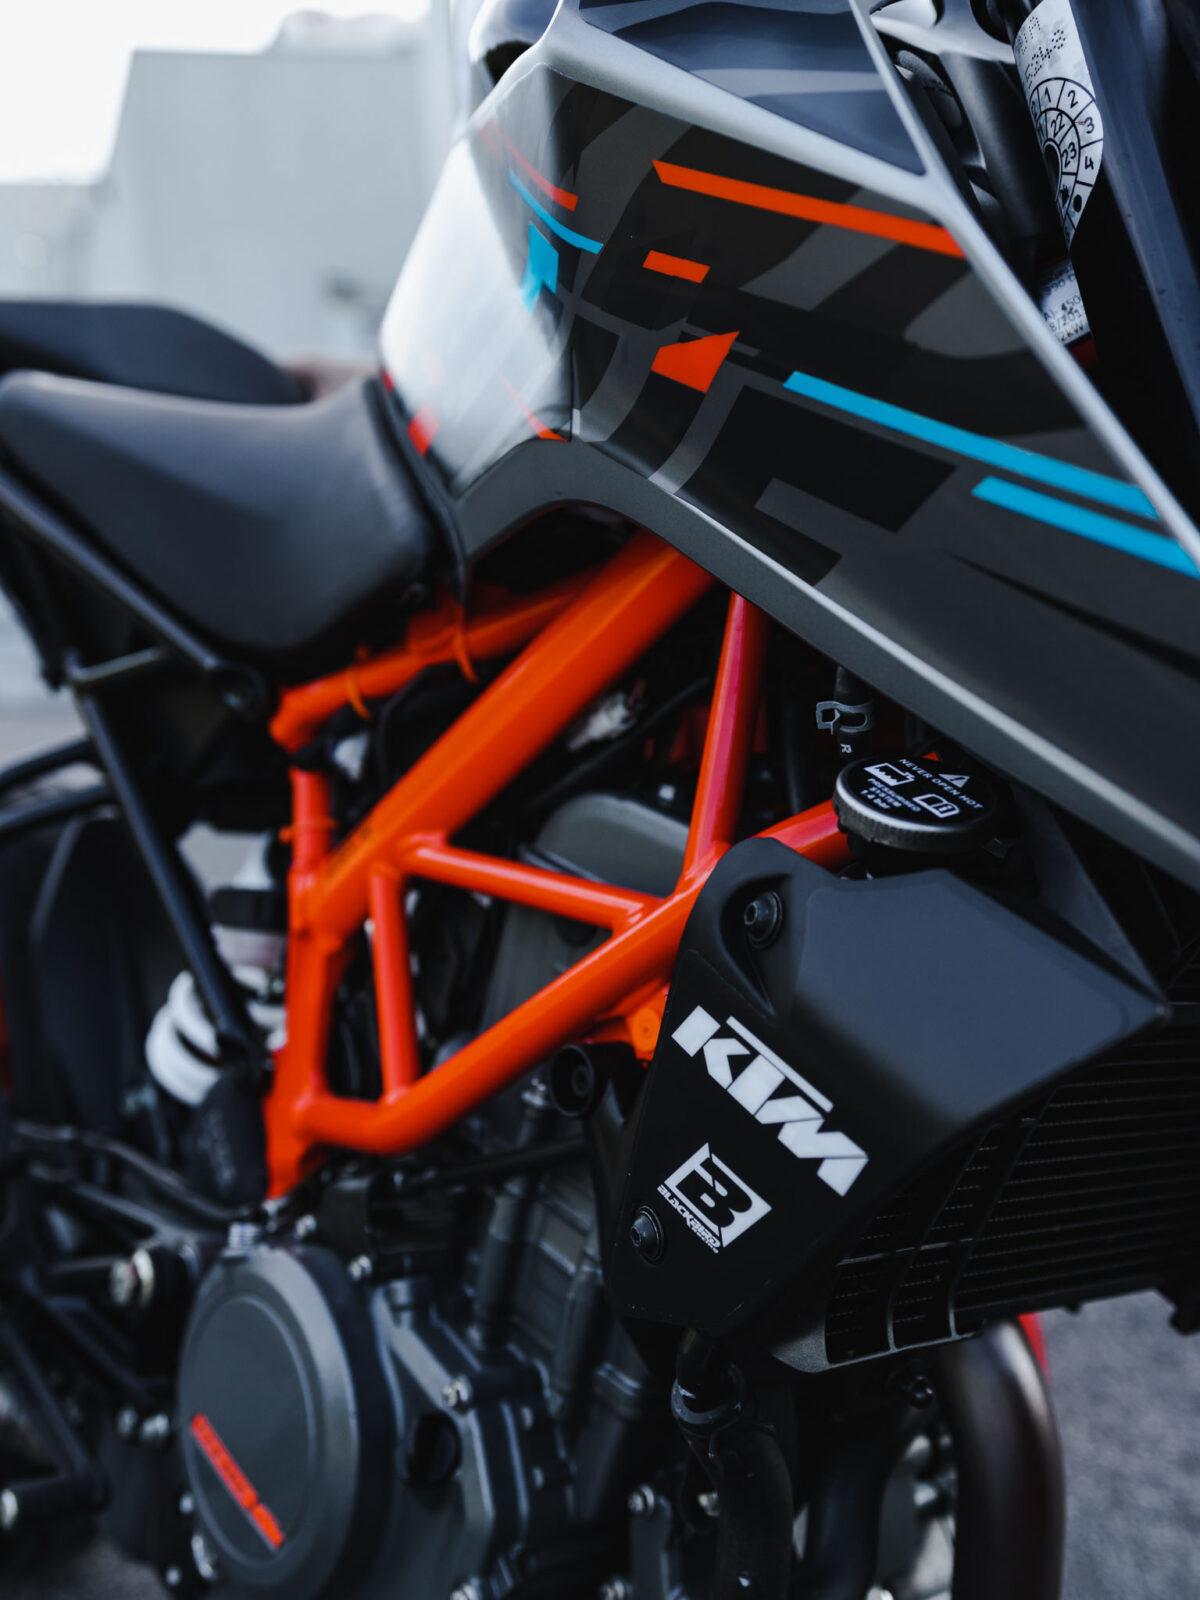 Rok Bagoros sticker kit The Mad rabbit 2021 for KTM DUKE 125 200 250 390